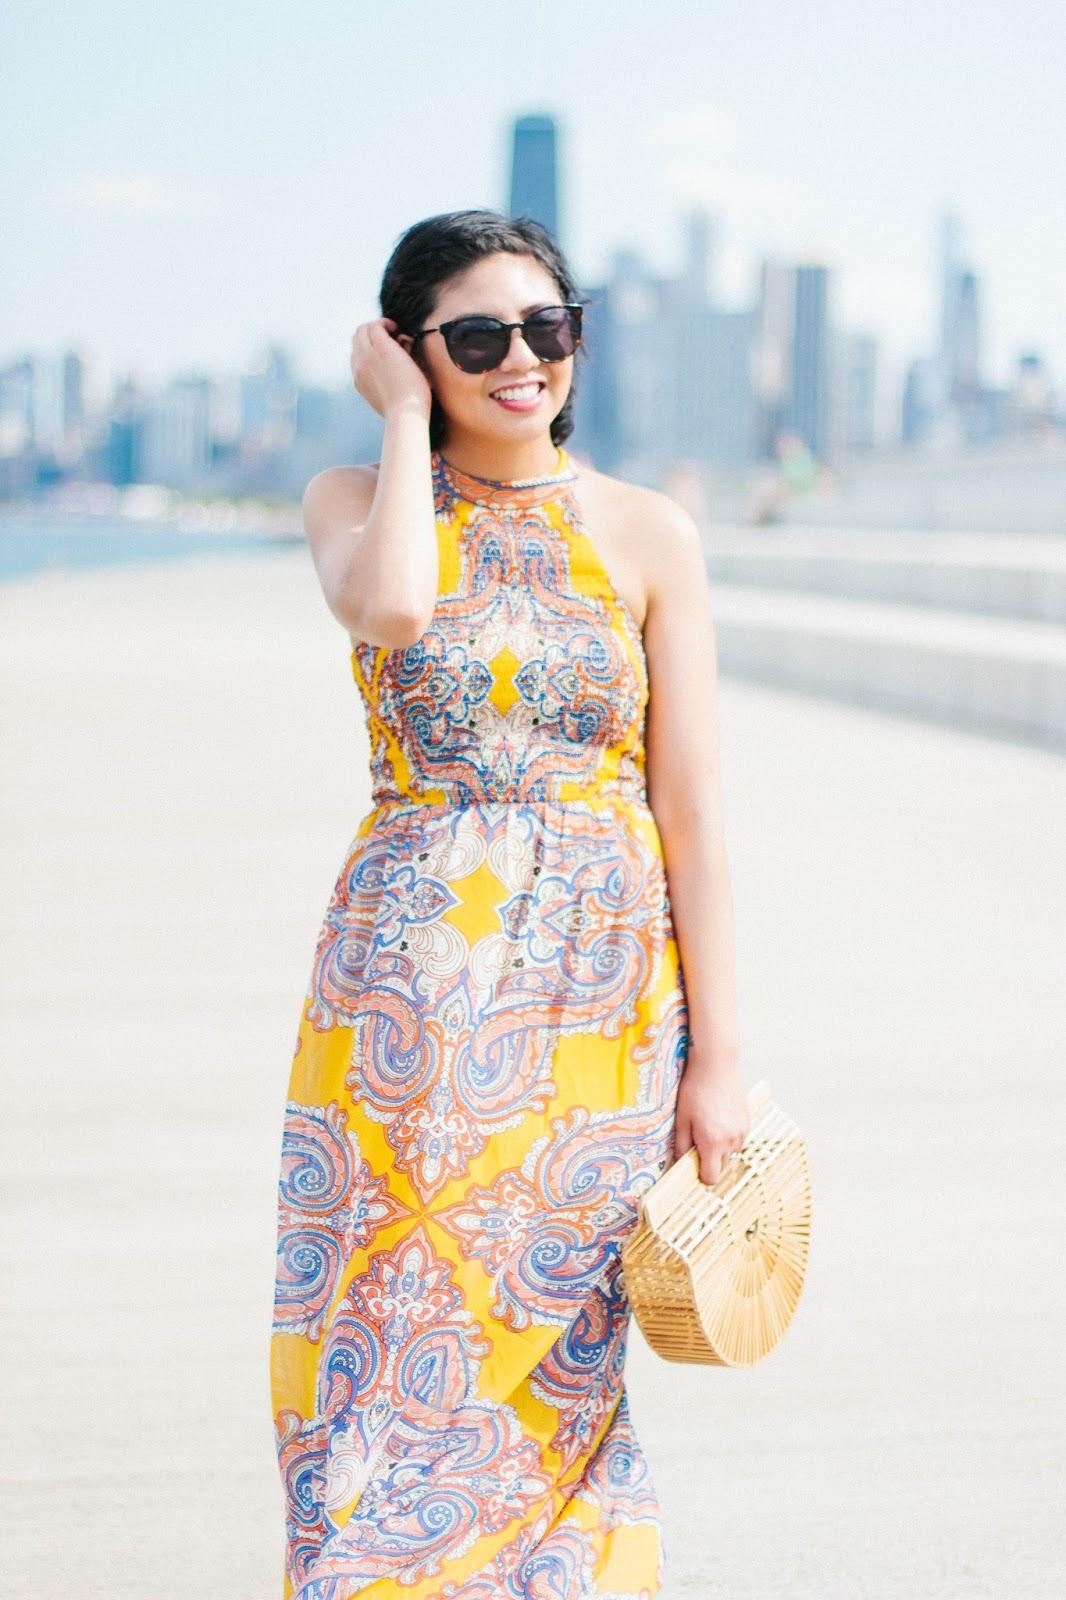 Shopping at T.J. Maxx and found a paisley print maxi dress